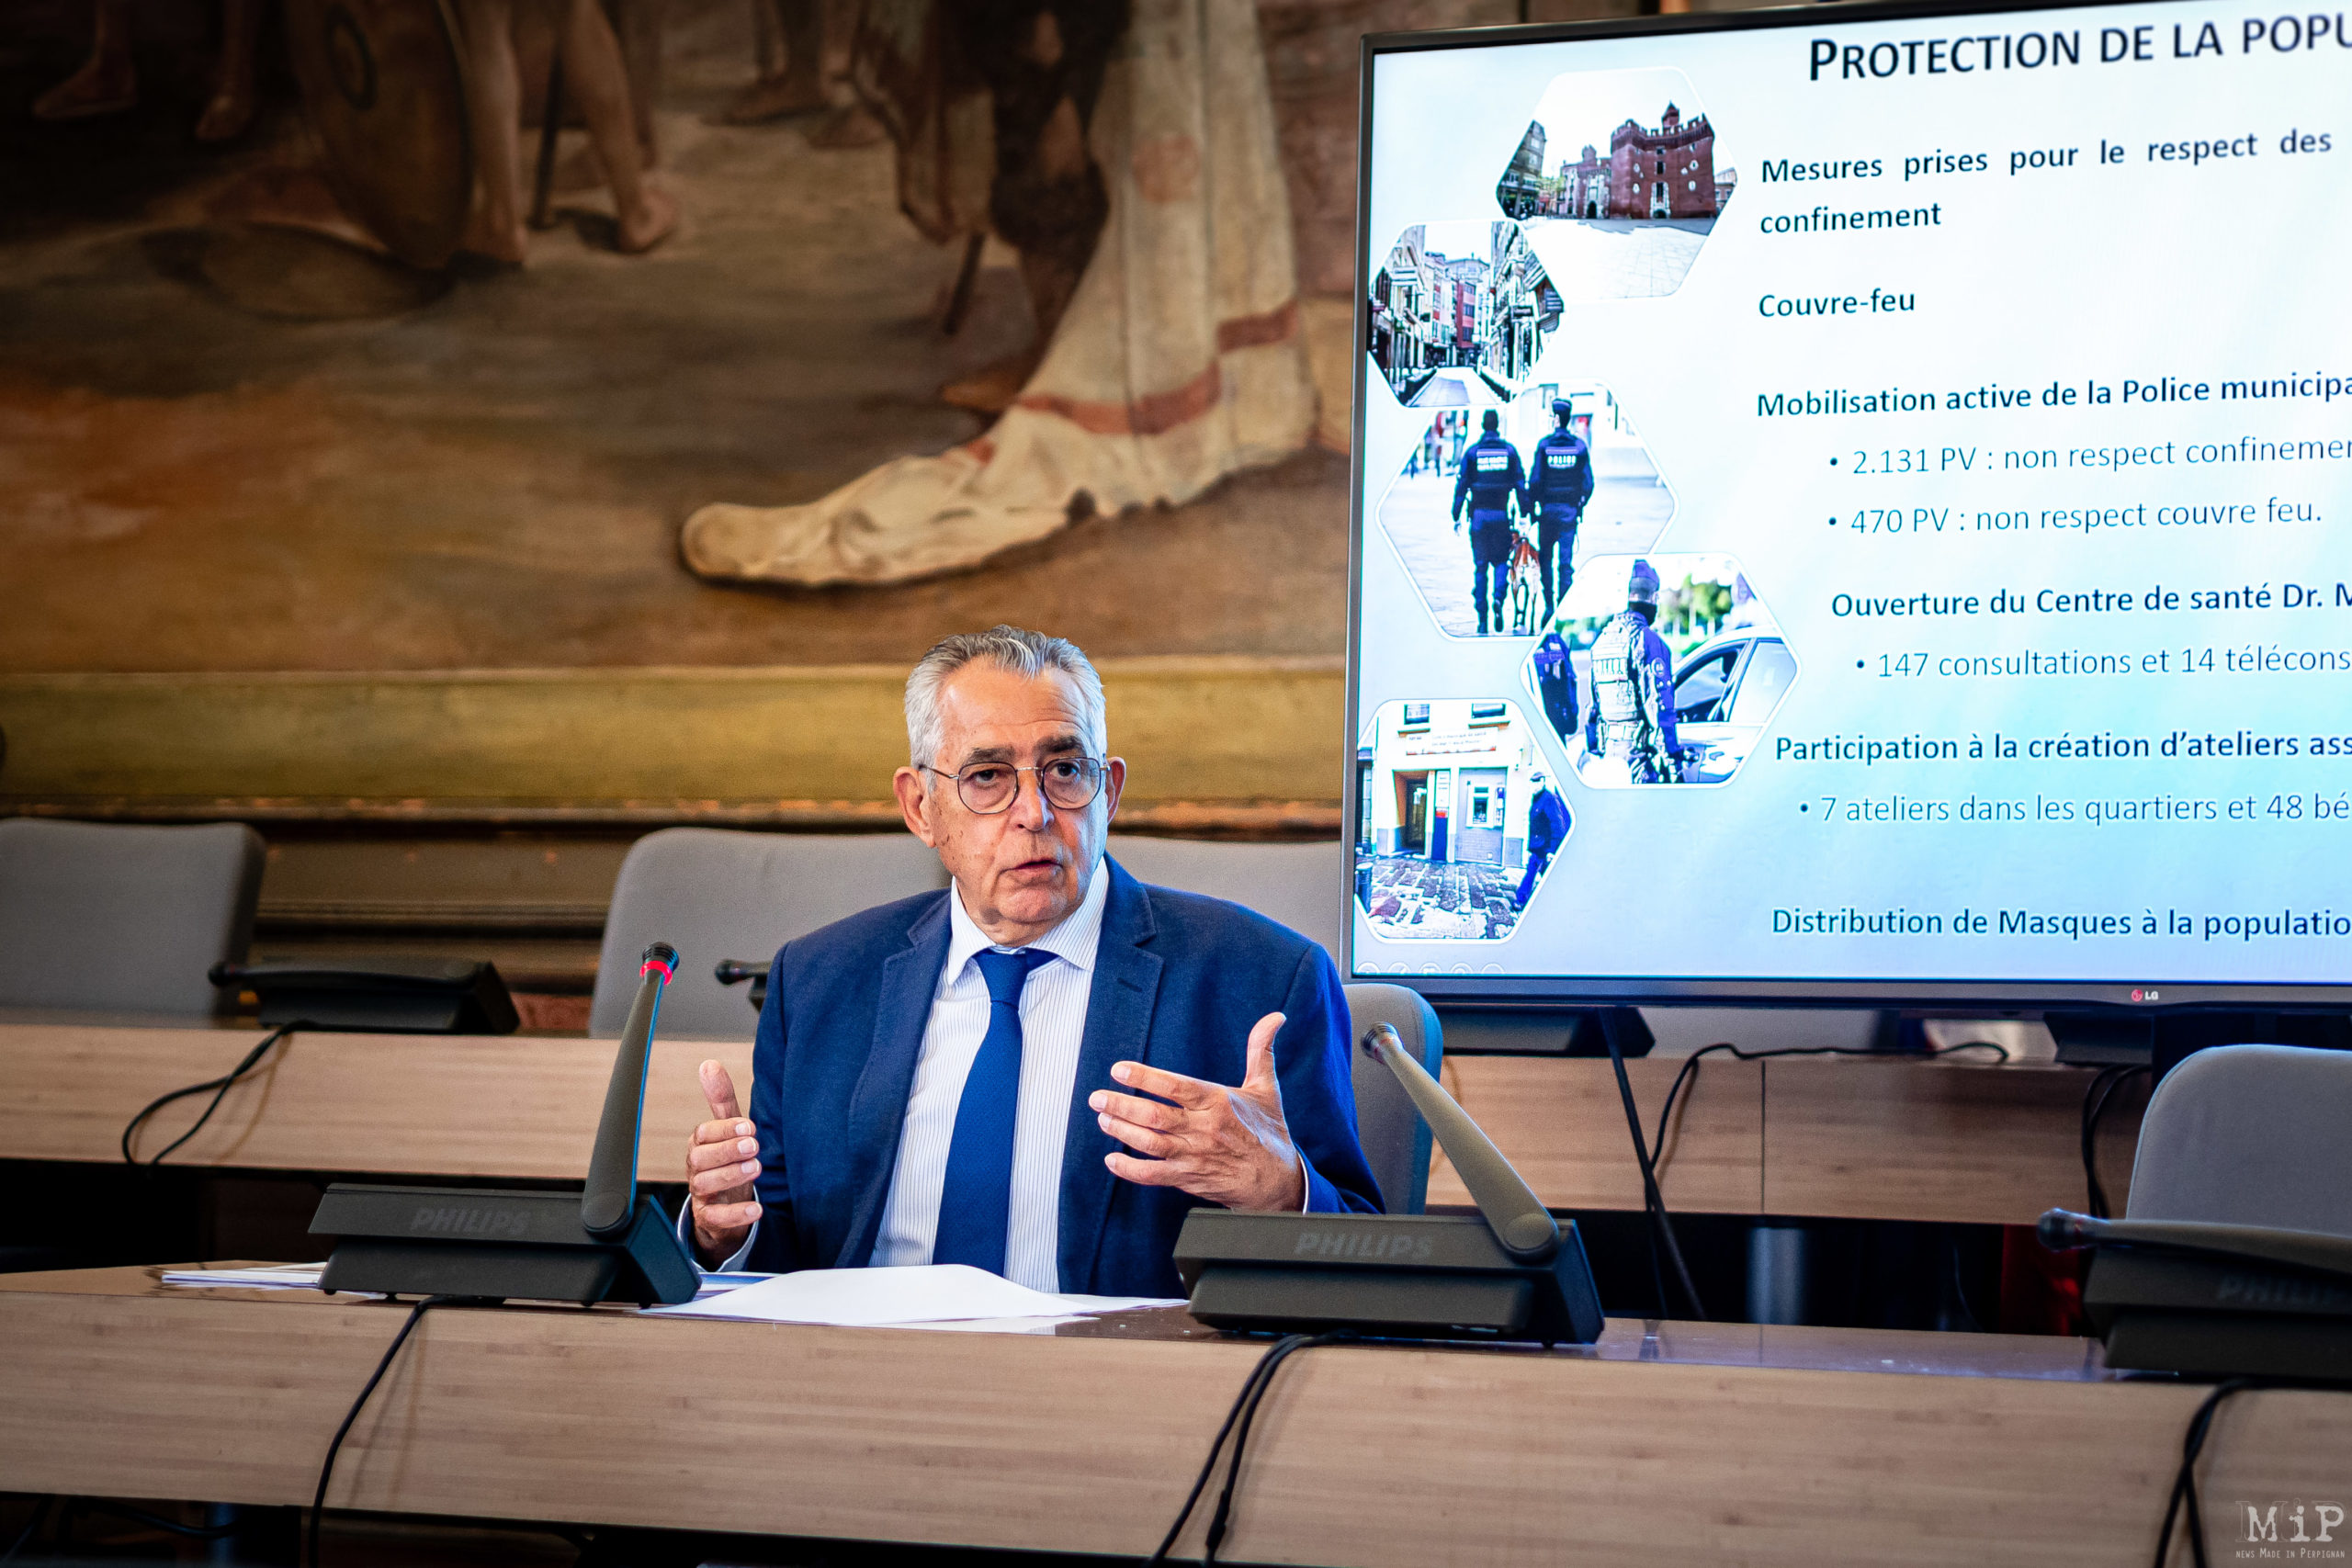 Conseil municipal mairie de Perpignan conférence de presse Pujol Aliot © Arnaud Le Vu / MiP / APM